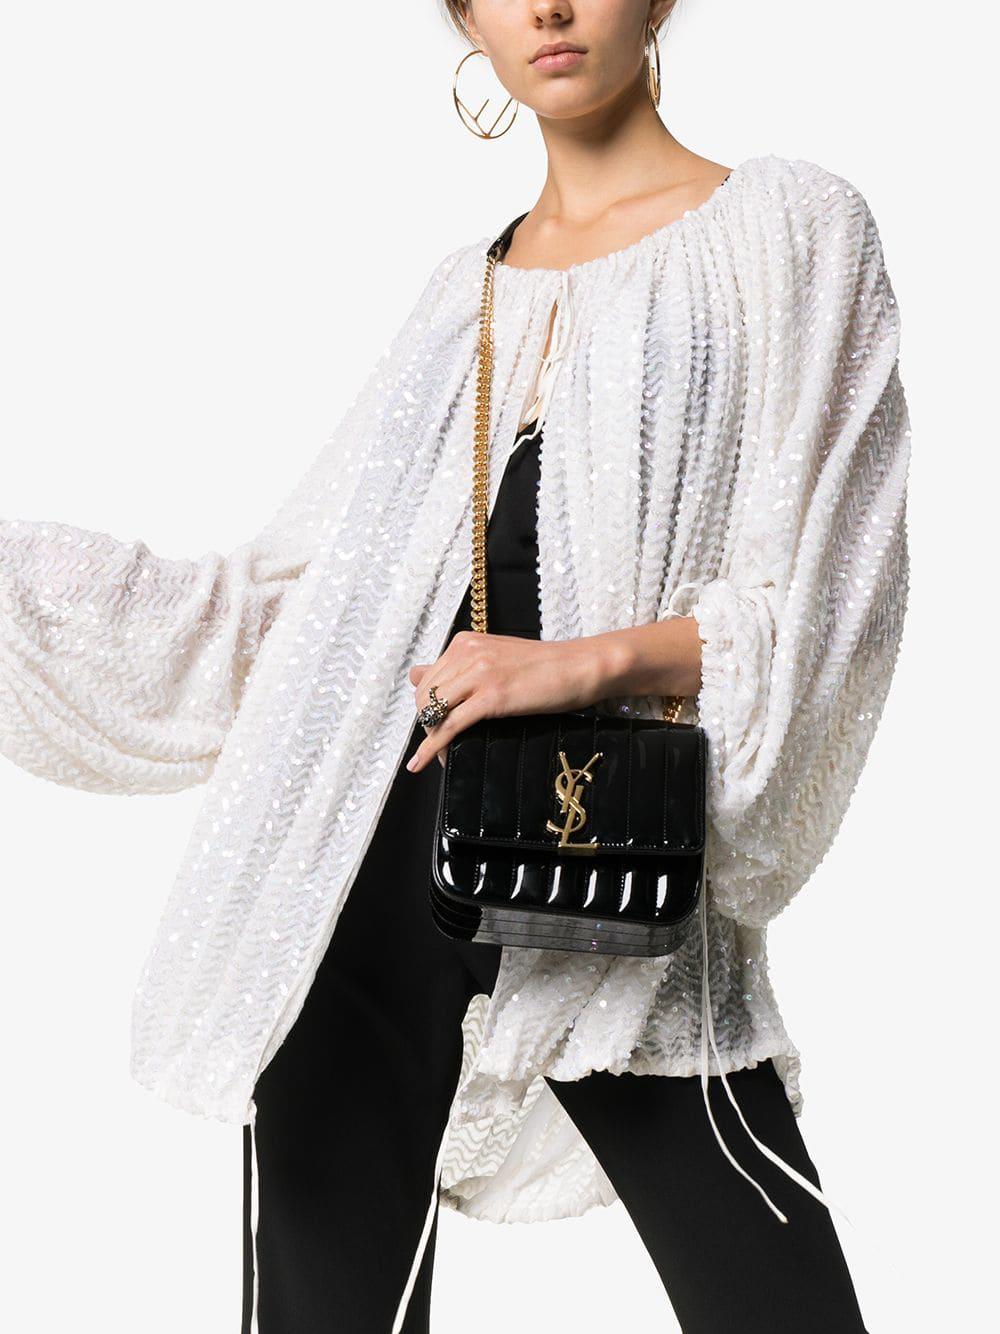 fc08f5abc8676f Saint Laurent Black Vicky Small Patent-Leather Cross Body Bag In 1000 Black